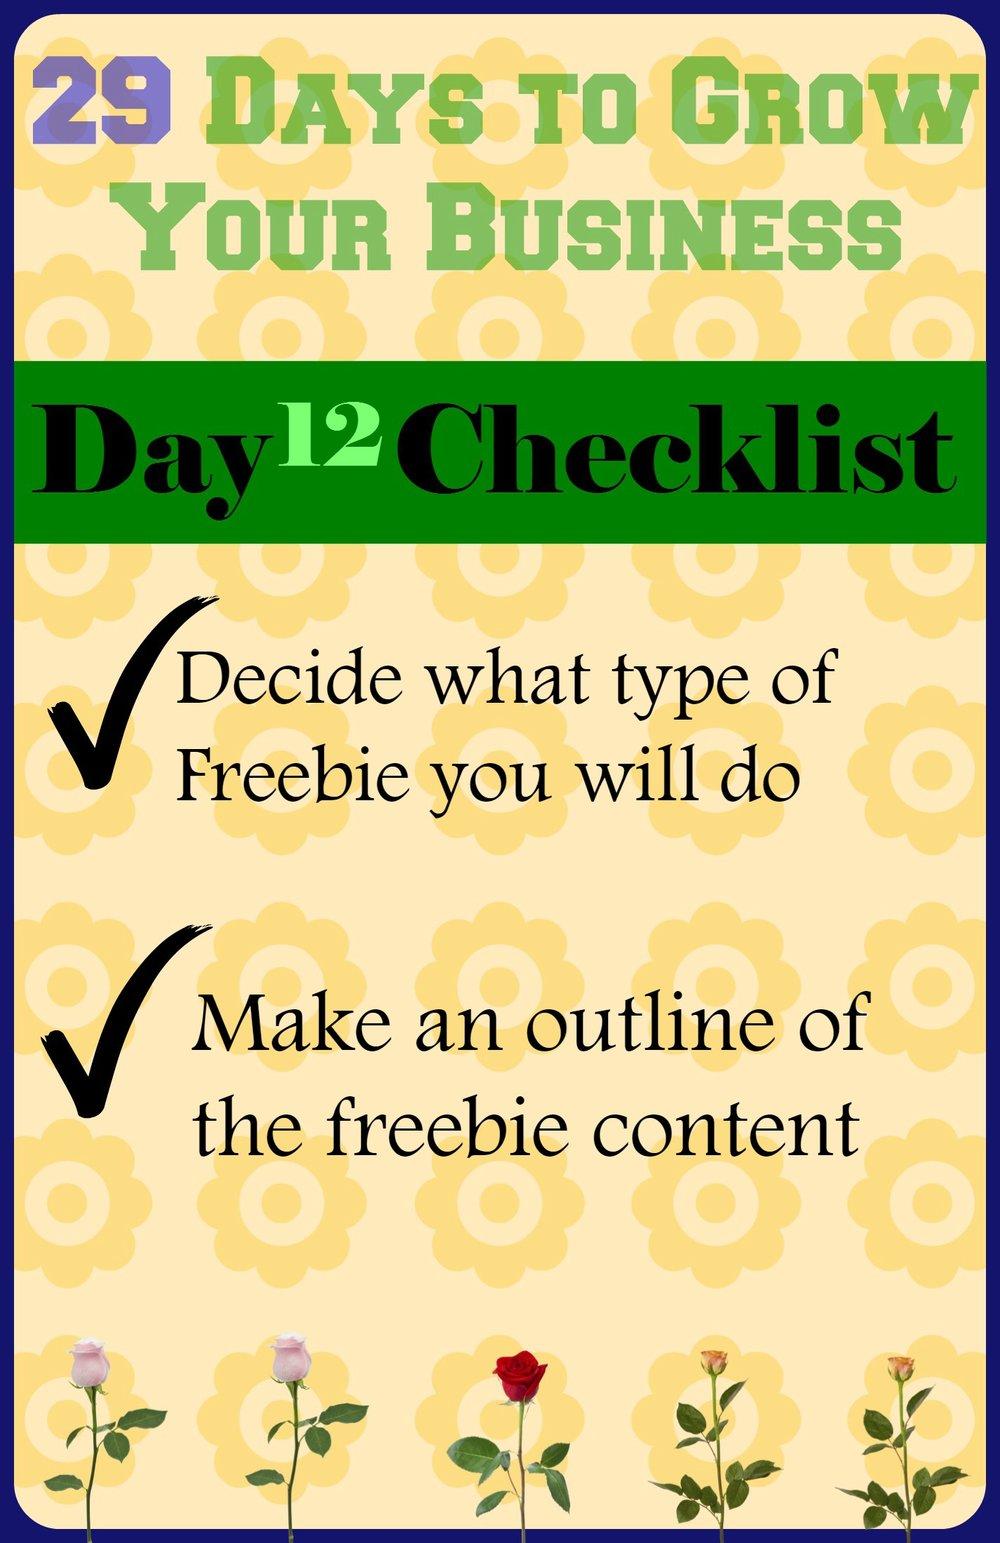 day 12 pinterest challenge.jpg